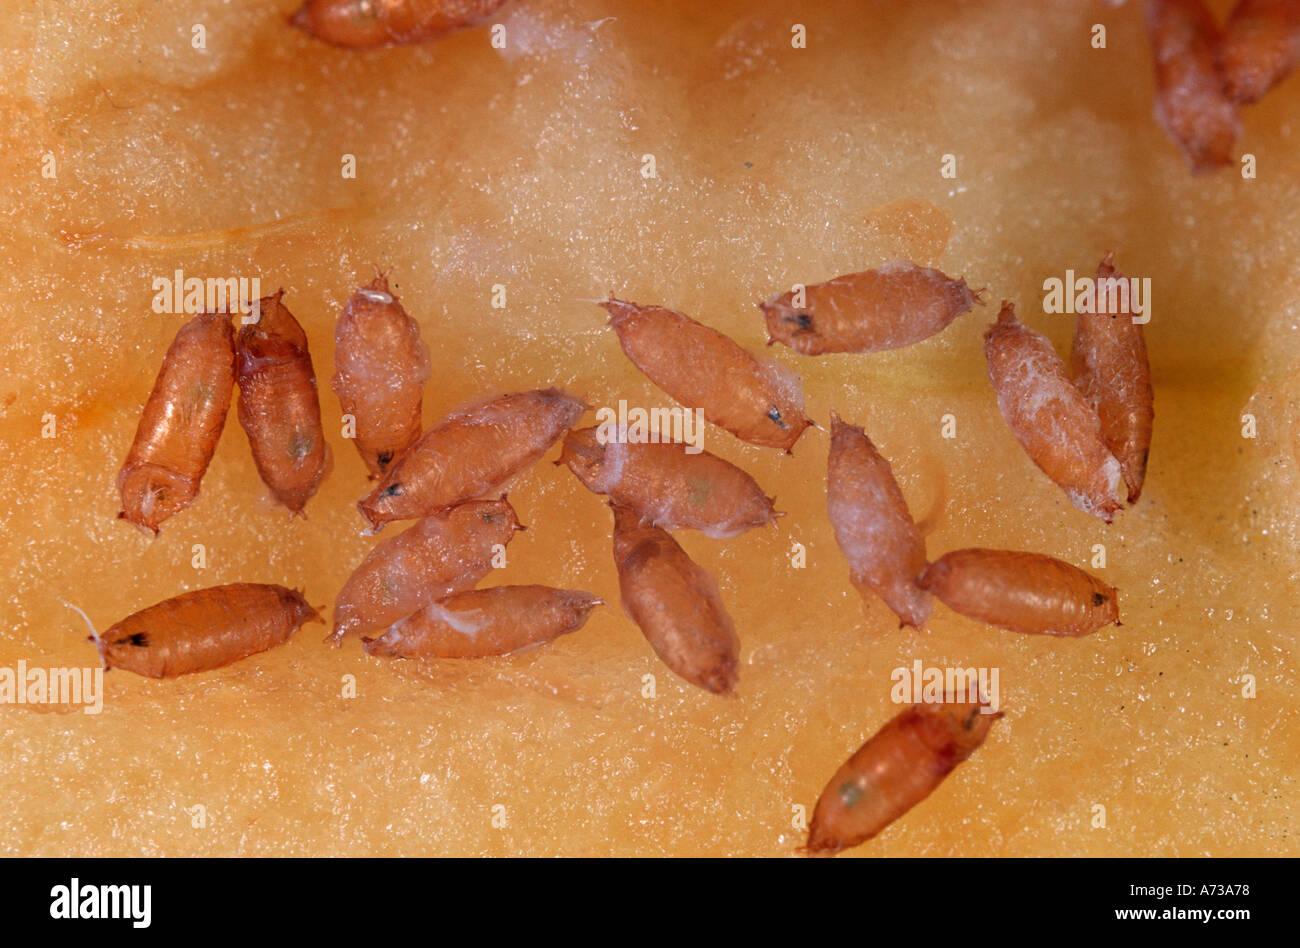 Fruit fly pupa - photo#51